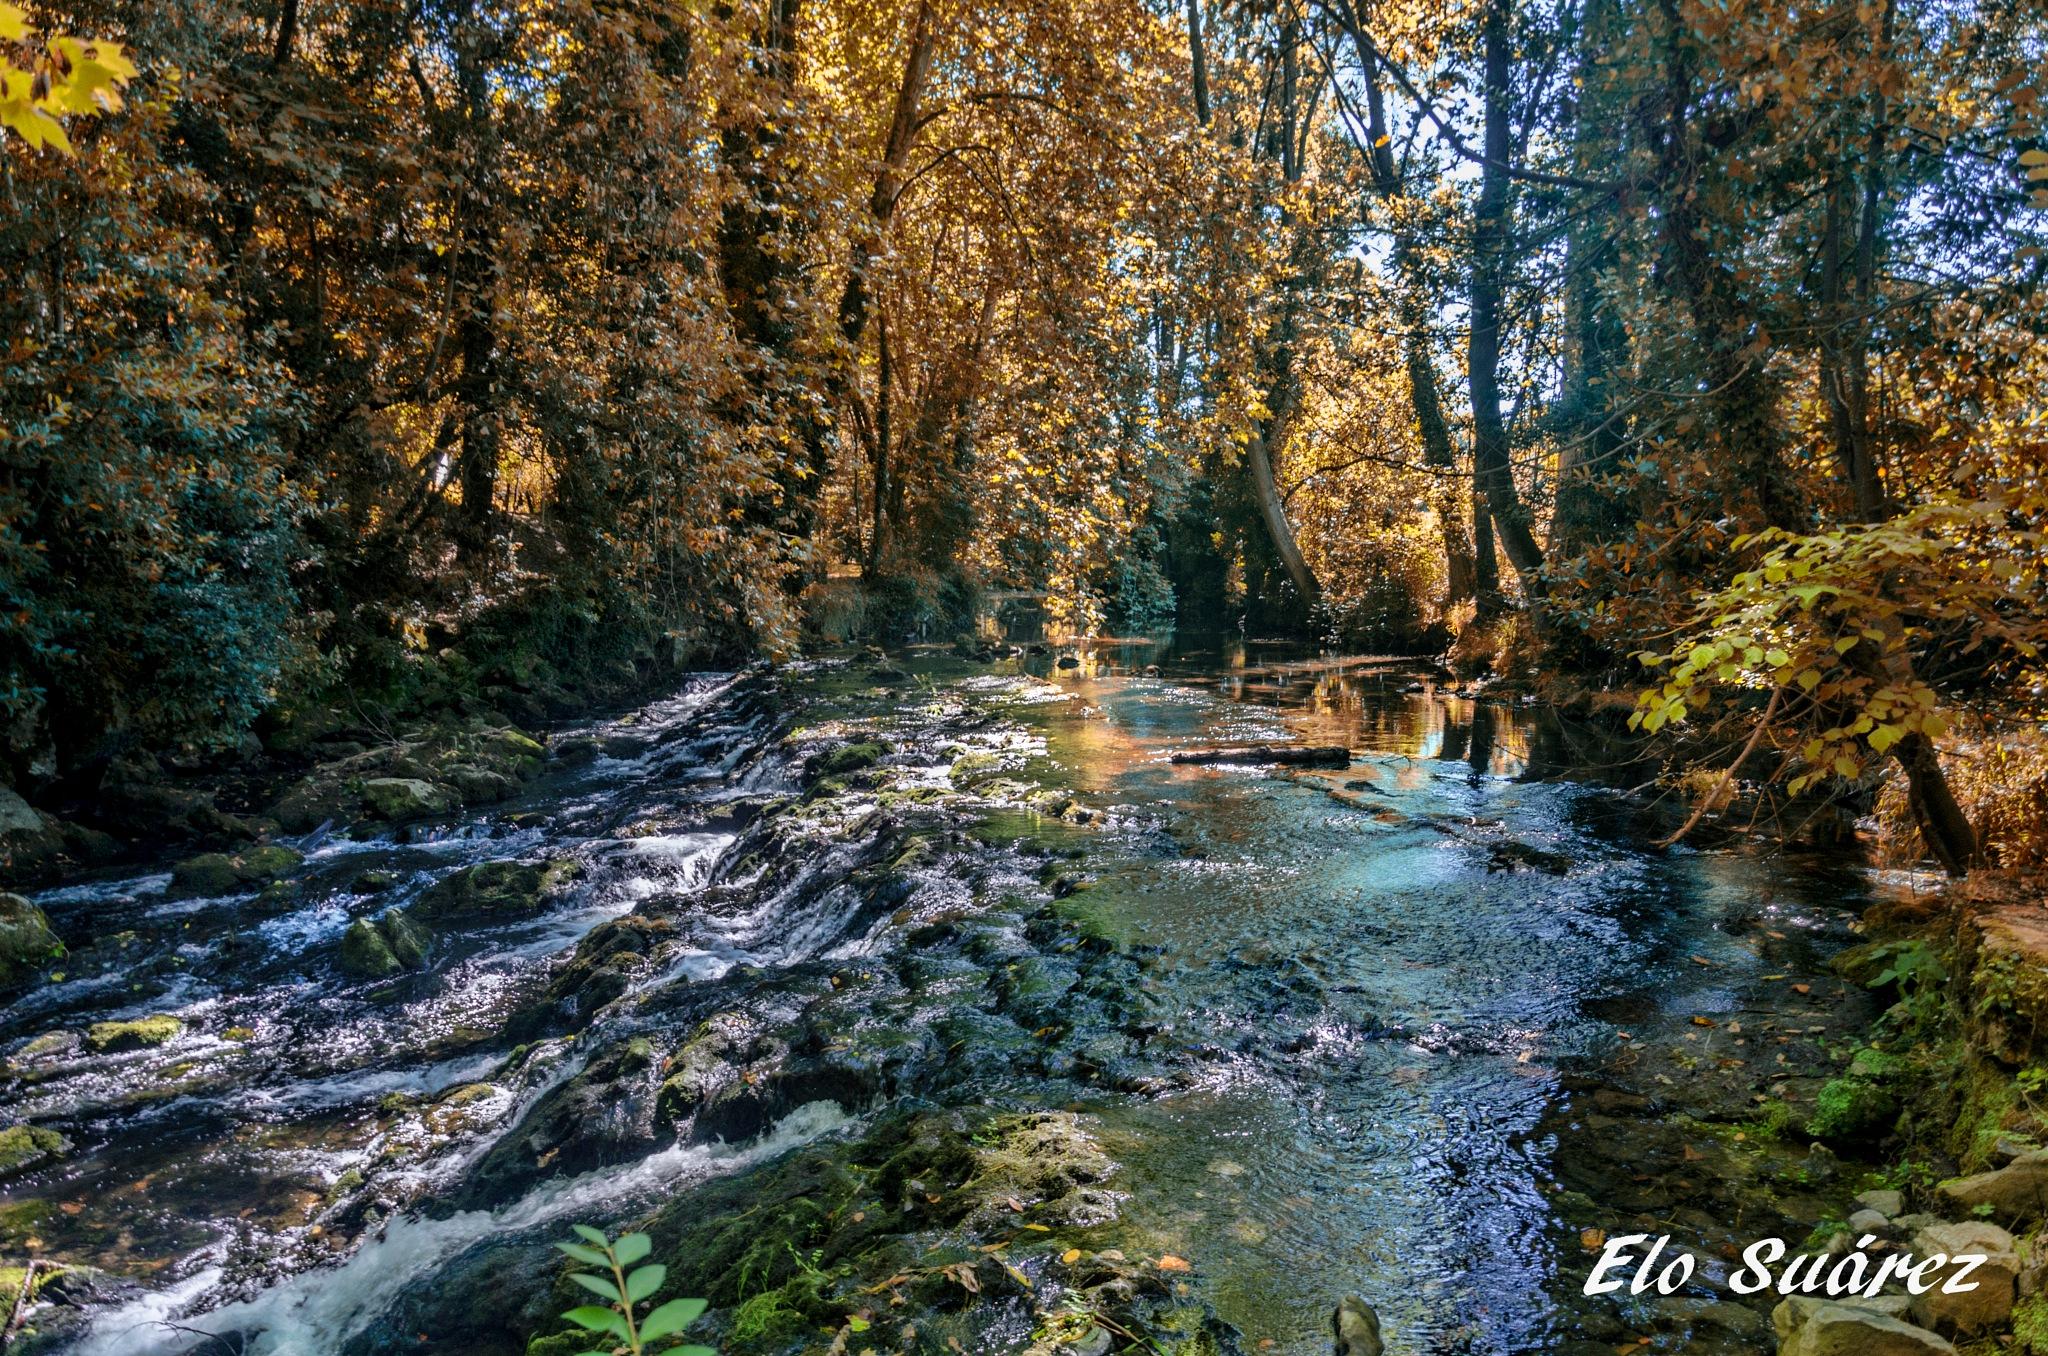 River in autumn by Elo Suárez